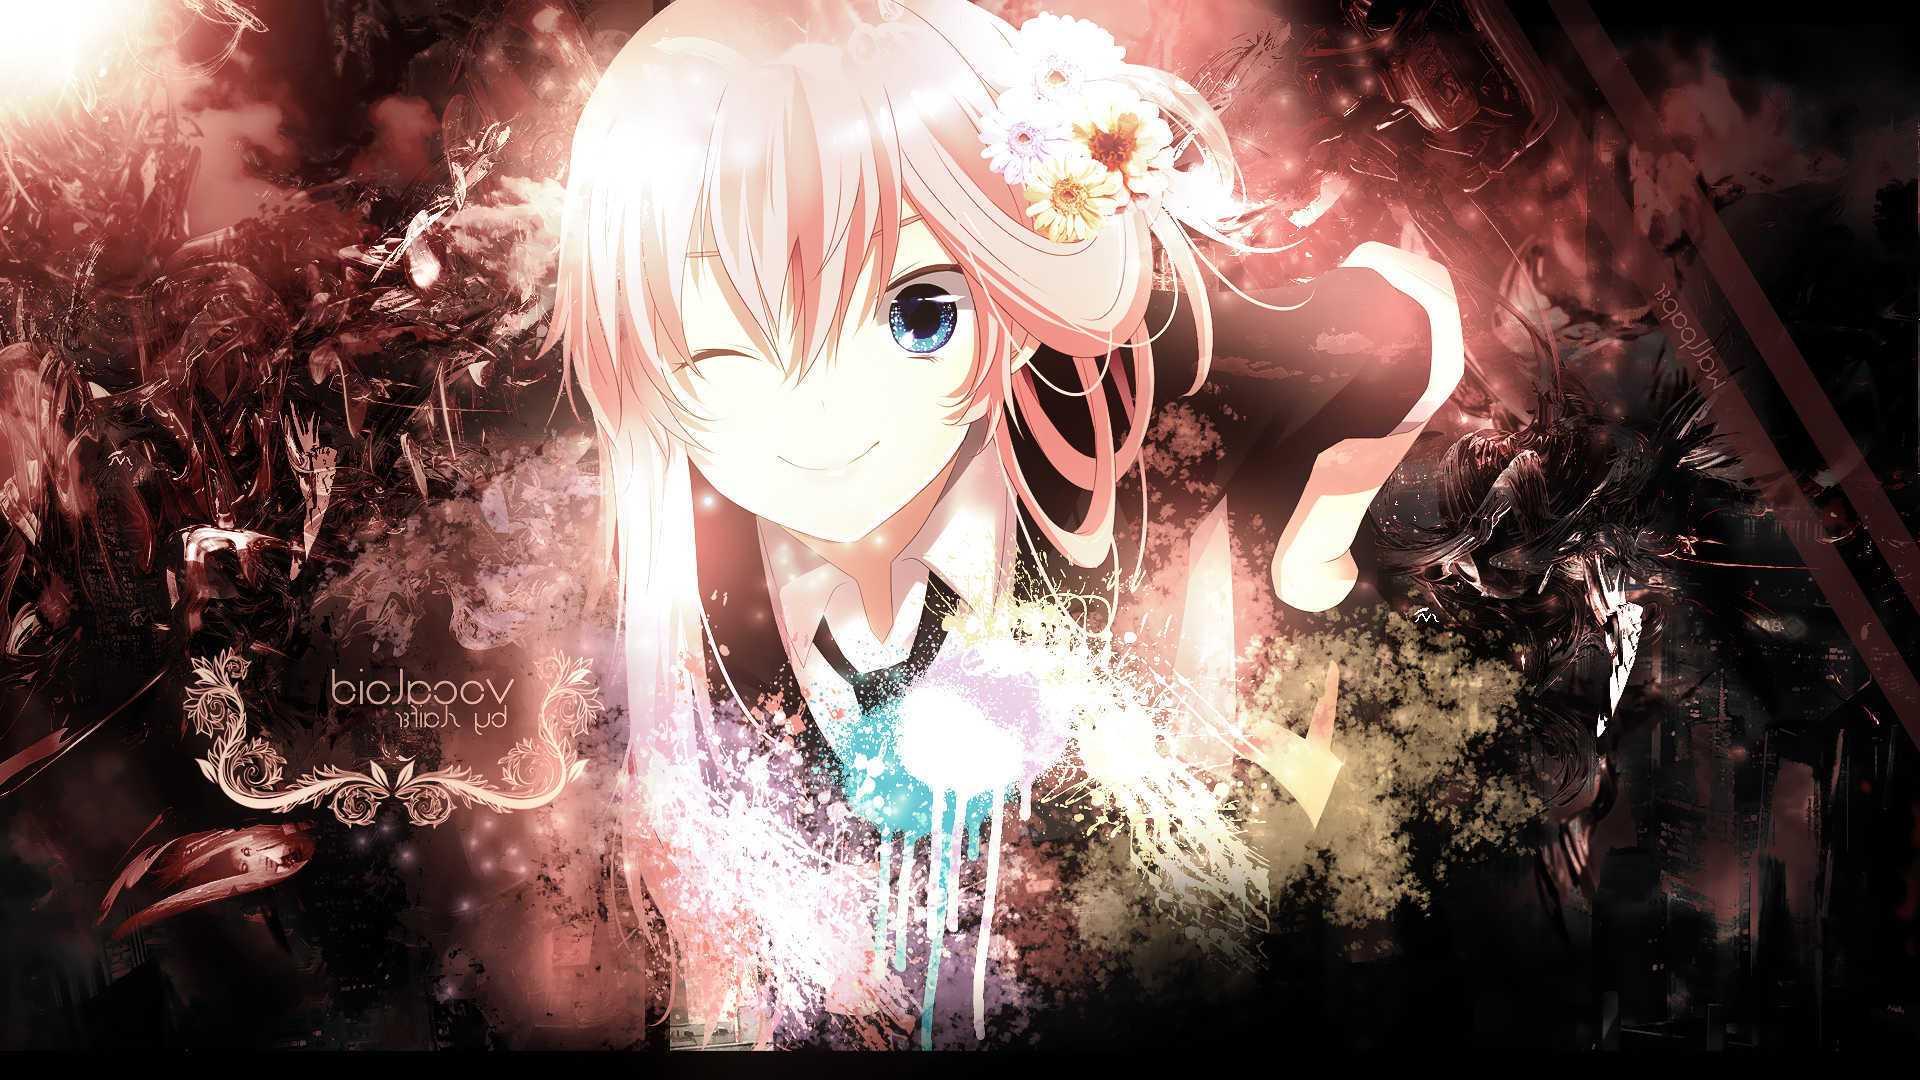 Hatsune Miku In A City Vocaloid Wallpaper Spooky